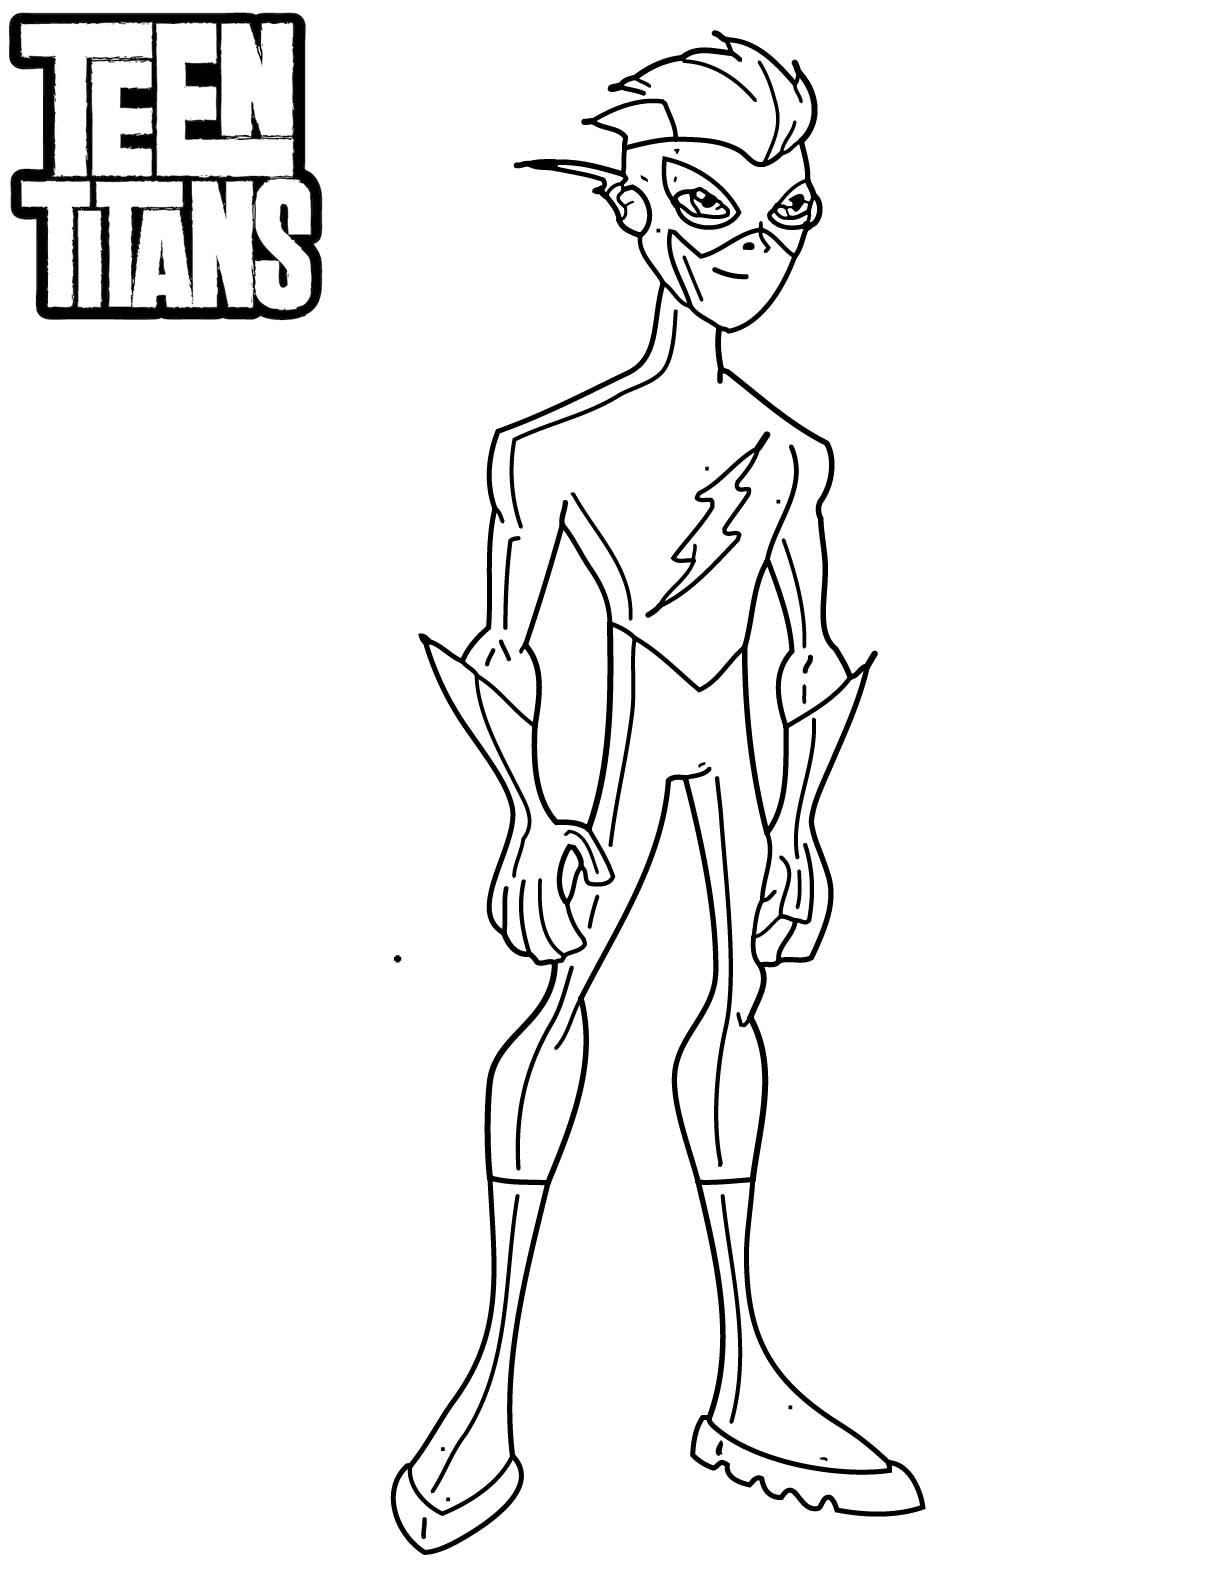 Desenho De Kid Flash De Jovens Titas Para Colorir Tudodesenhos